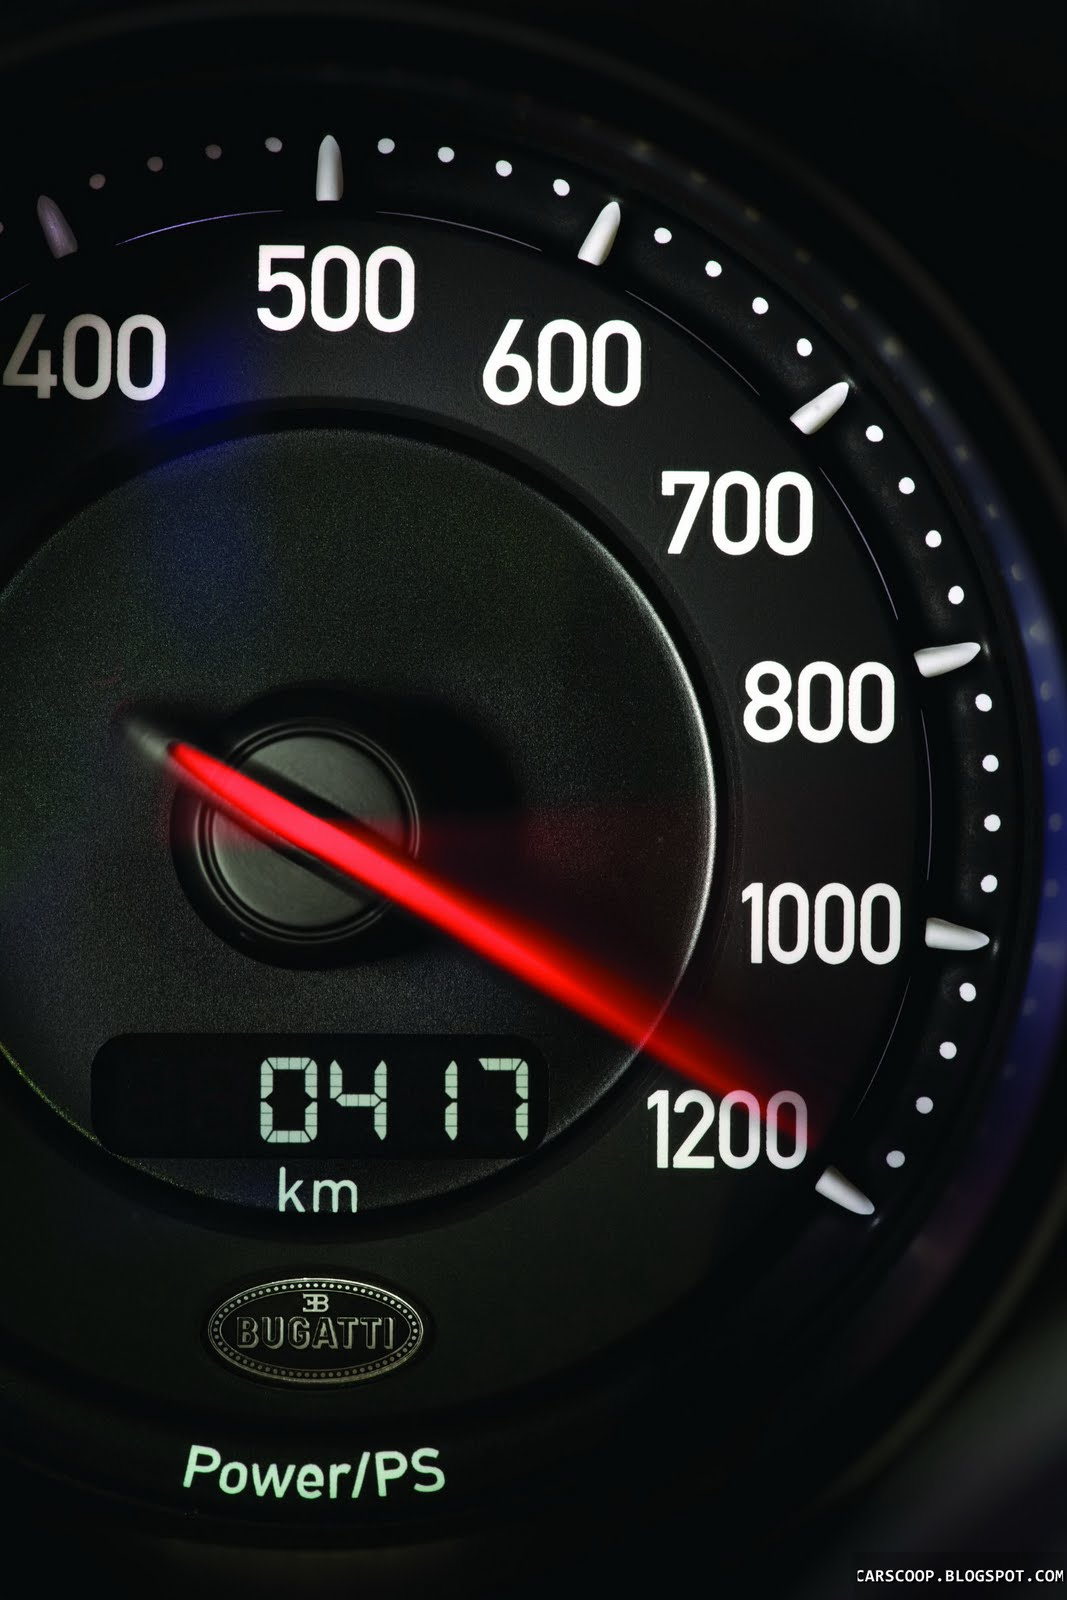 New Bugatti Veyron 16 4 Super Sport 1 200hp And 415km H